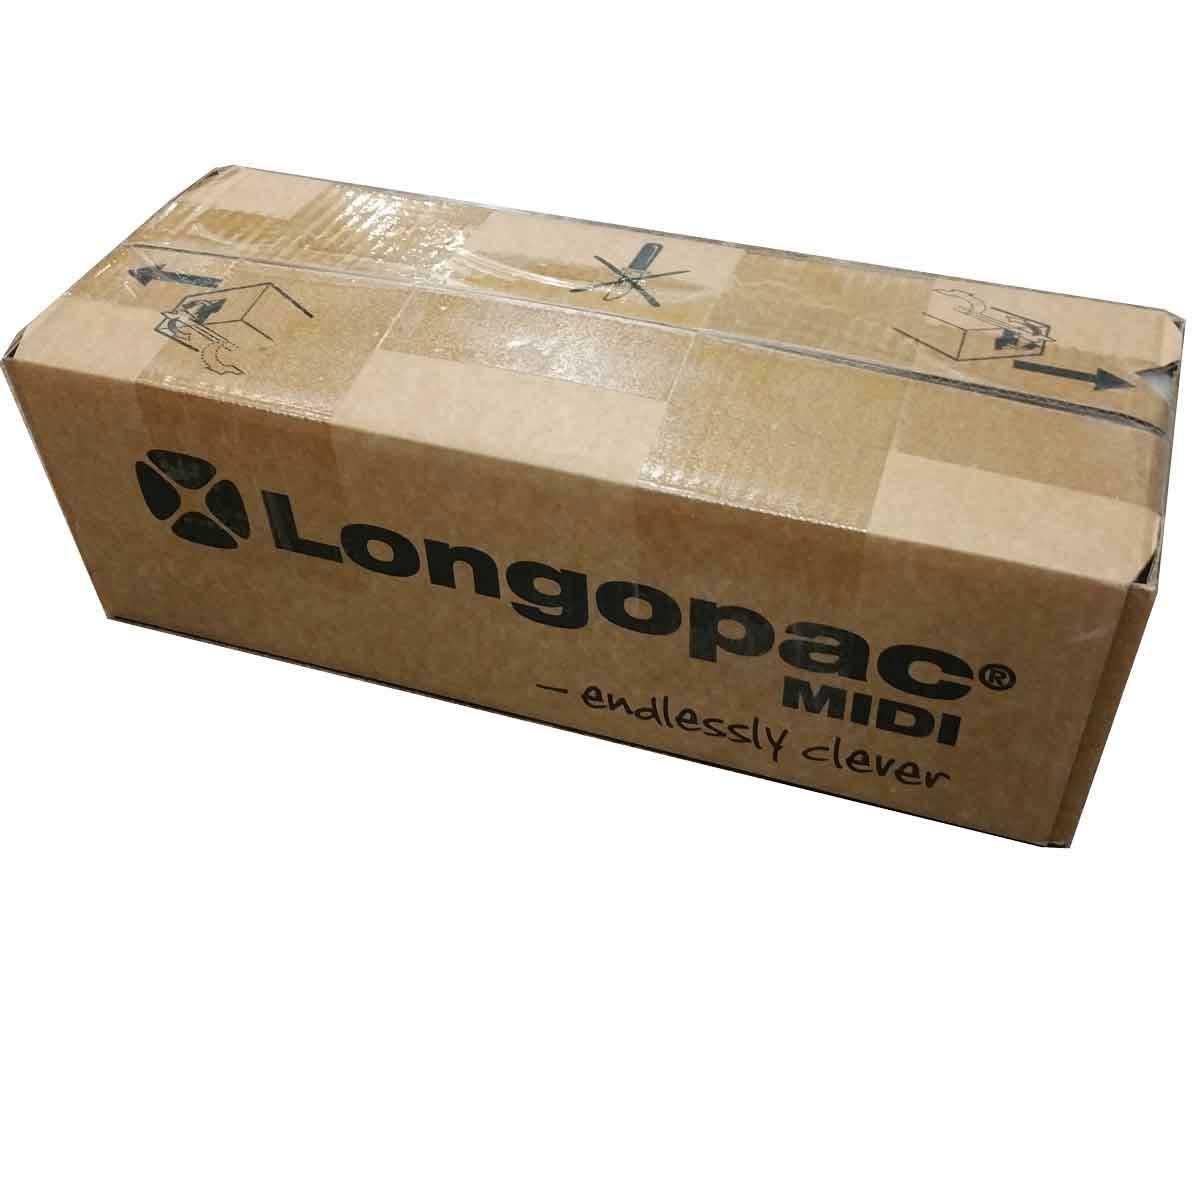 Husqvarna Longopac Bags 66 ft.